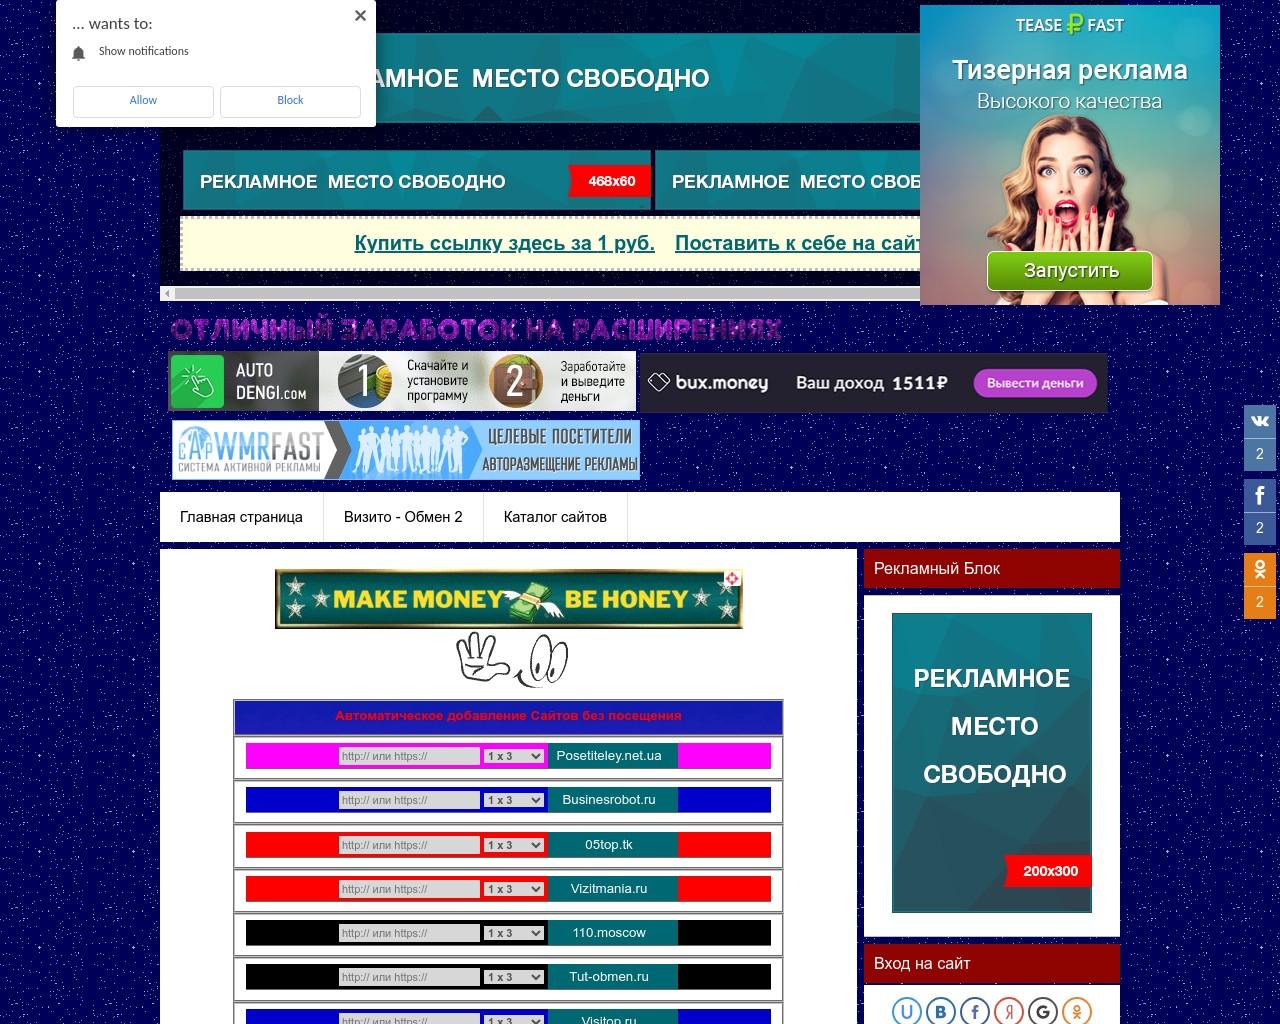 Перейти на сайт http://rabotabitcoin.ucoz.net